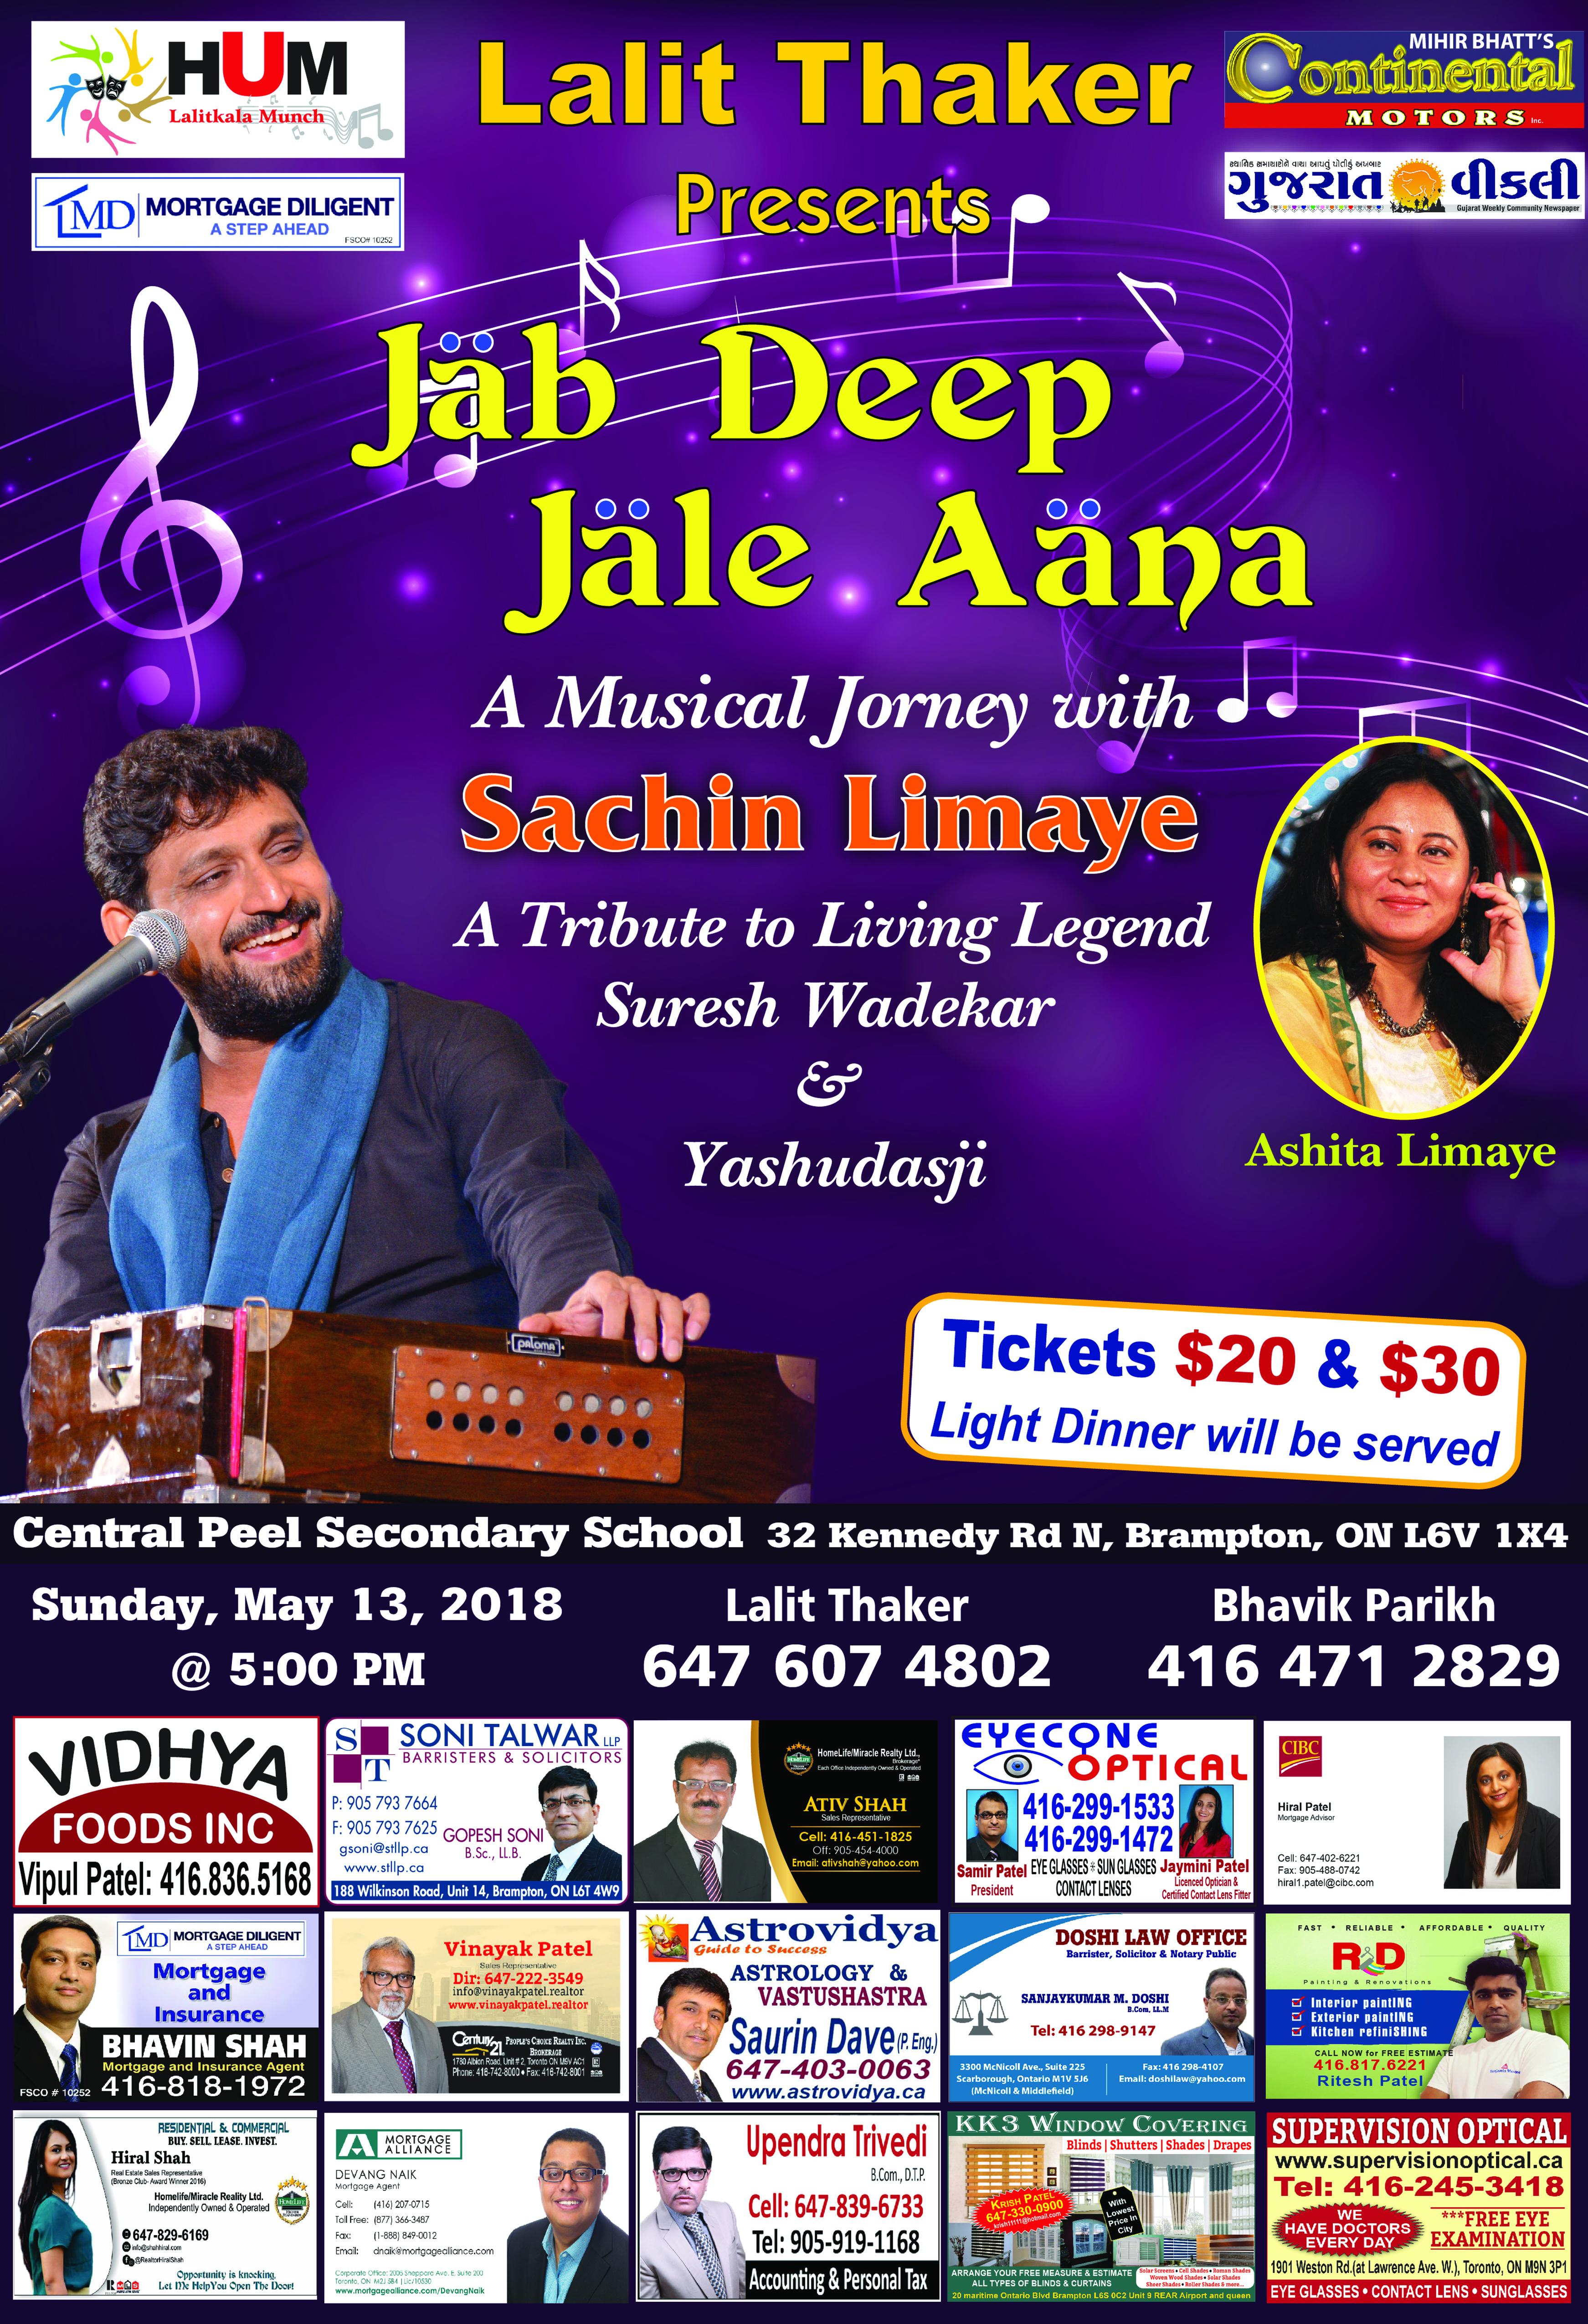 Jab Deep Jale Apna